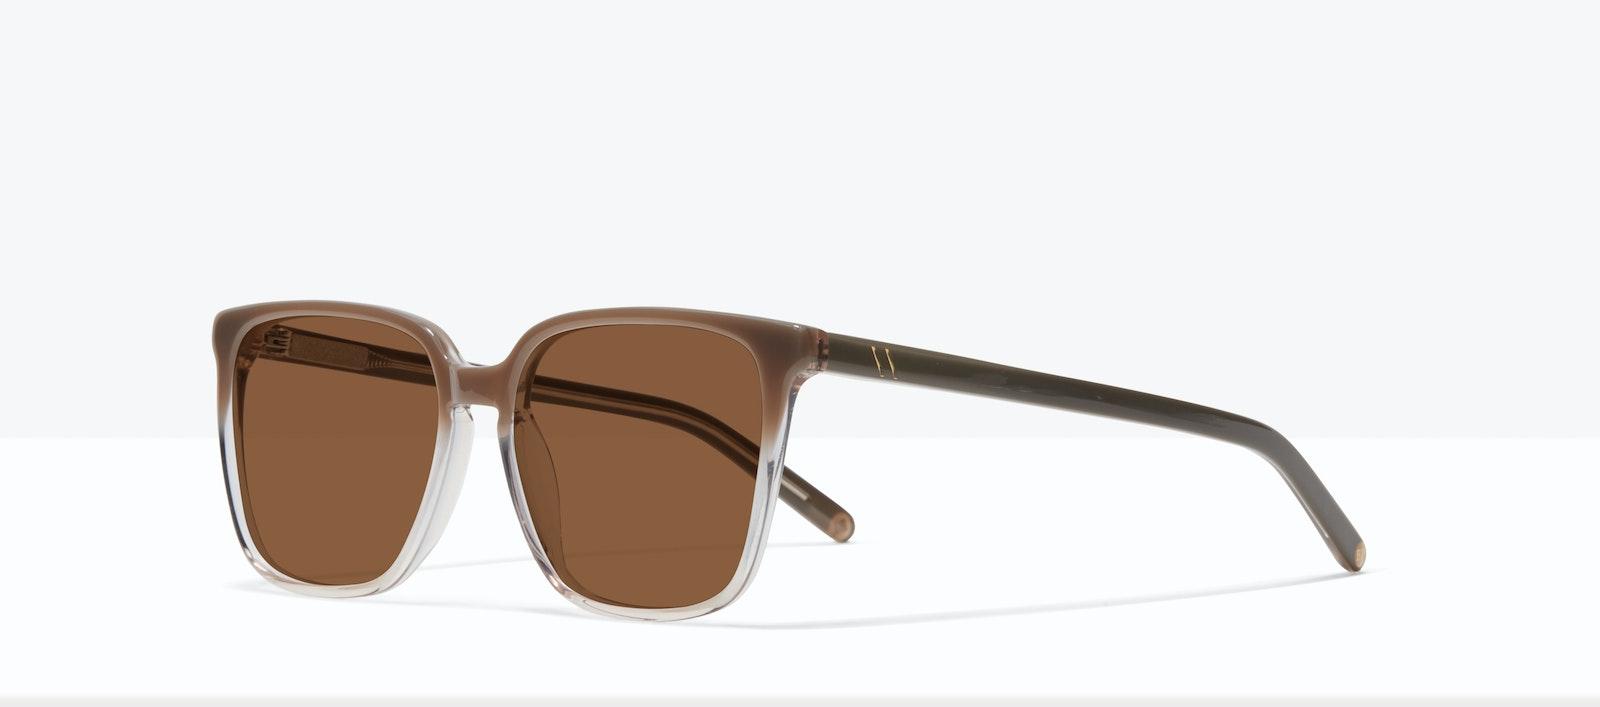 Affordable Fashion Glasses Square Sunglasses Women Runway S Smokey Ombré Tilt